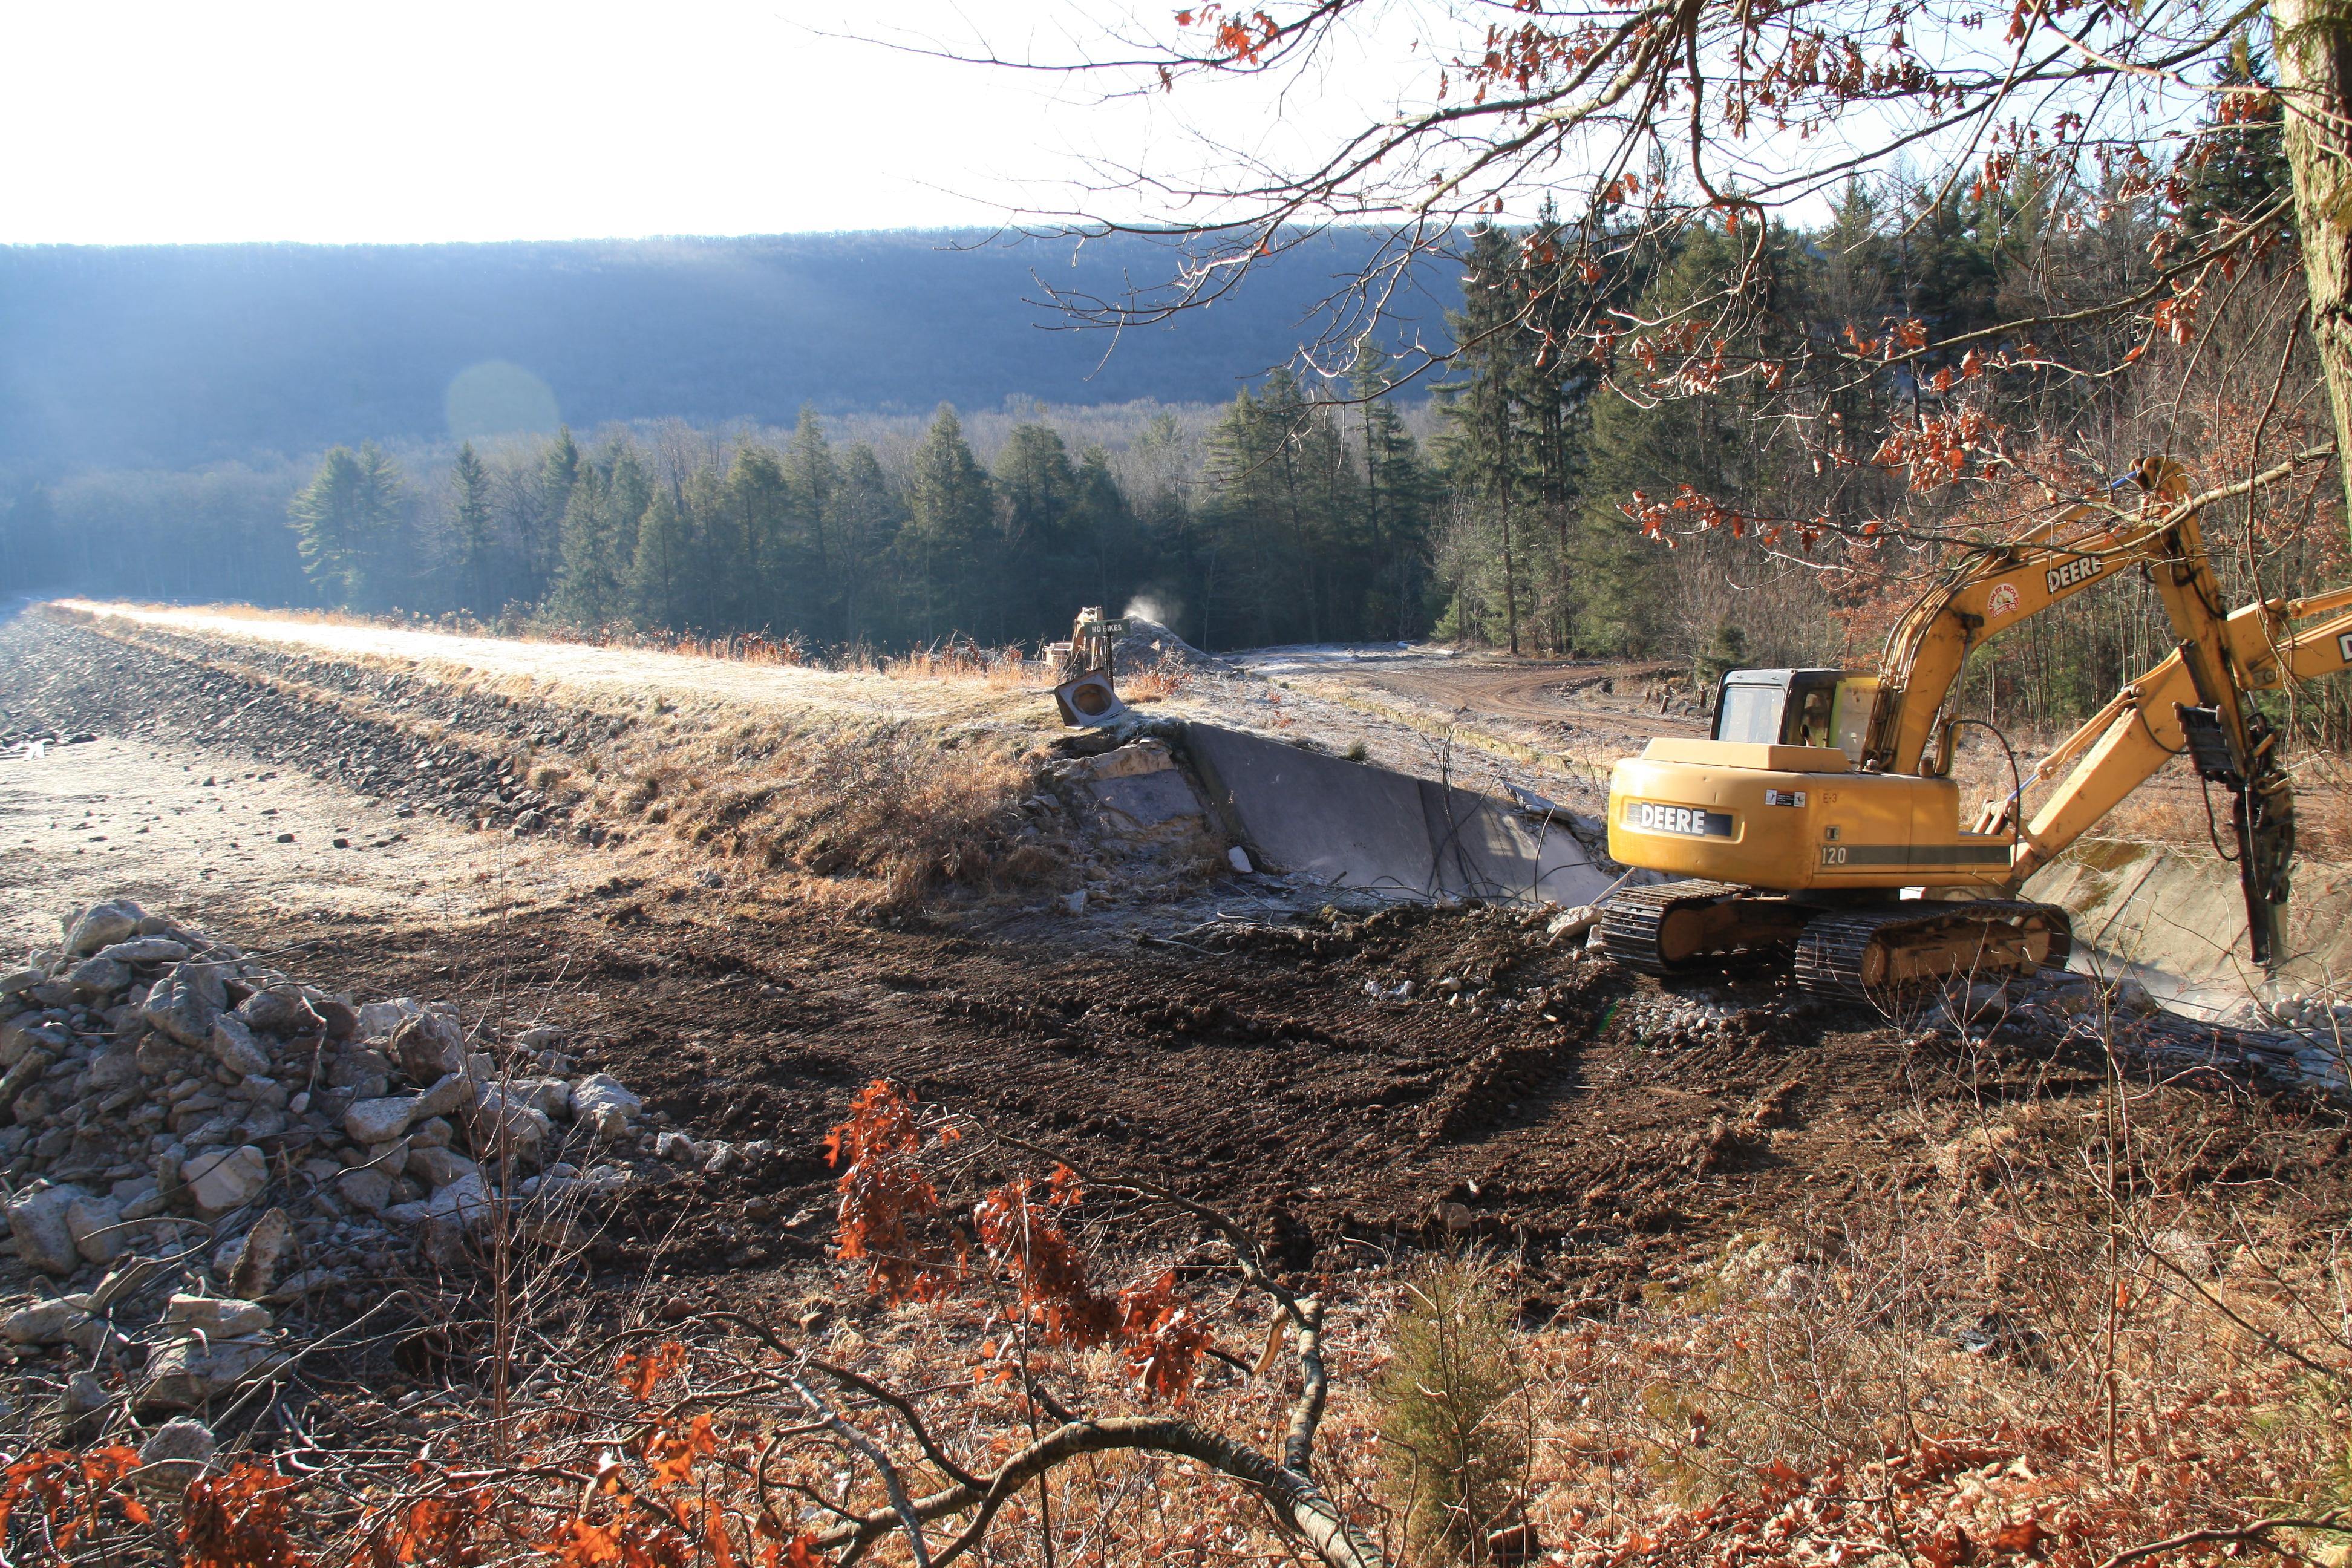 FIVE YEARS AGO: Upper Owl Creek Dam rehab work underway